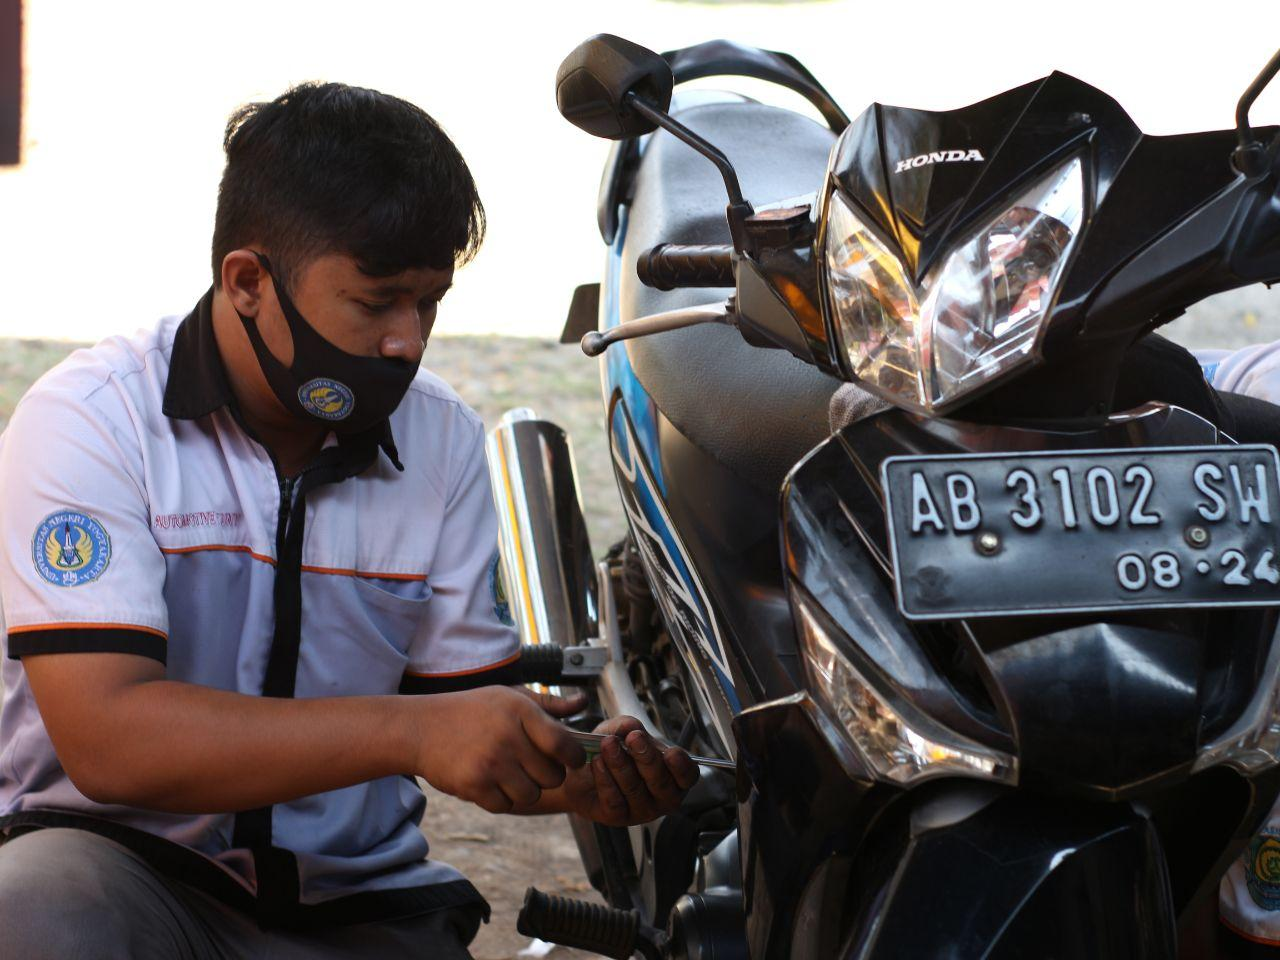 Fakultas Teknik Universitas Negeri Yogyakarta jurusan Pendidikan Teknik Otomotif mengadakan Bakti Sosial berupa servis motor GRATIS pada tanggal 22 – 23 Agustus 2020 di kelurahan Ngalang, Gedang Sari, Gunung Kidul.